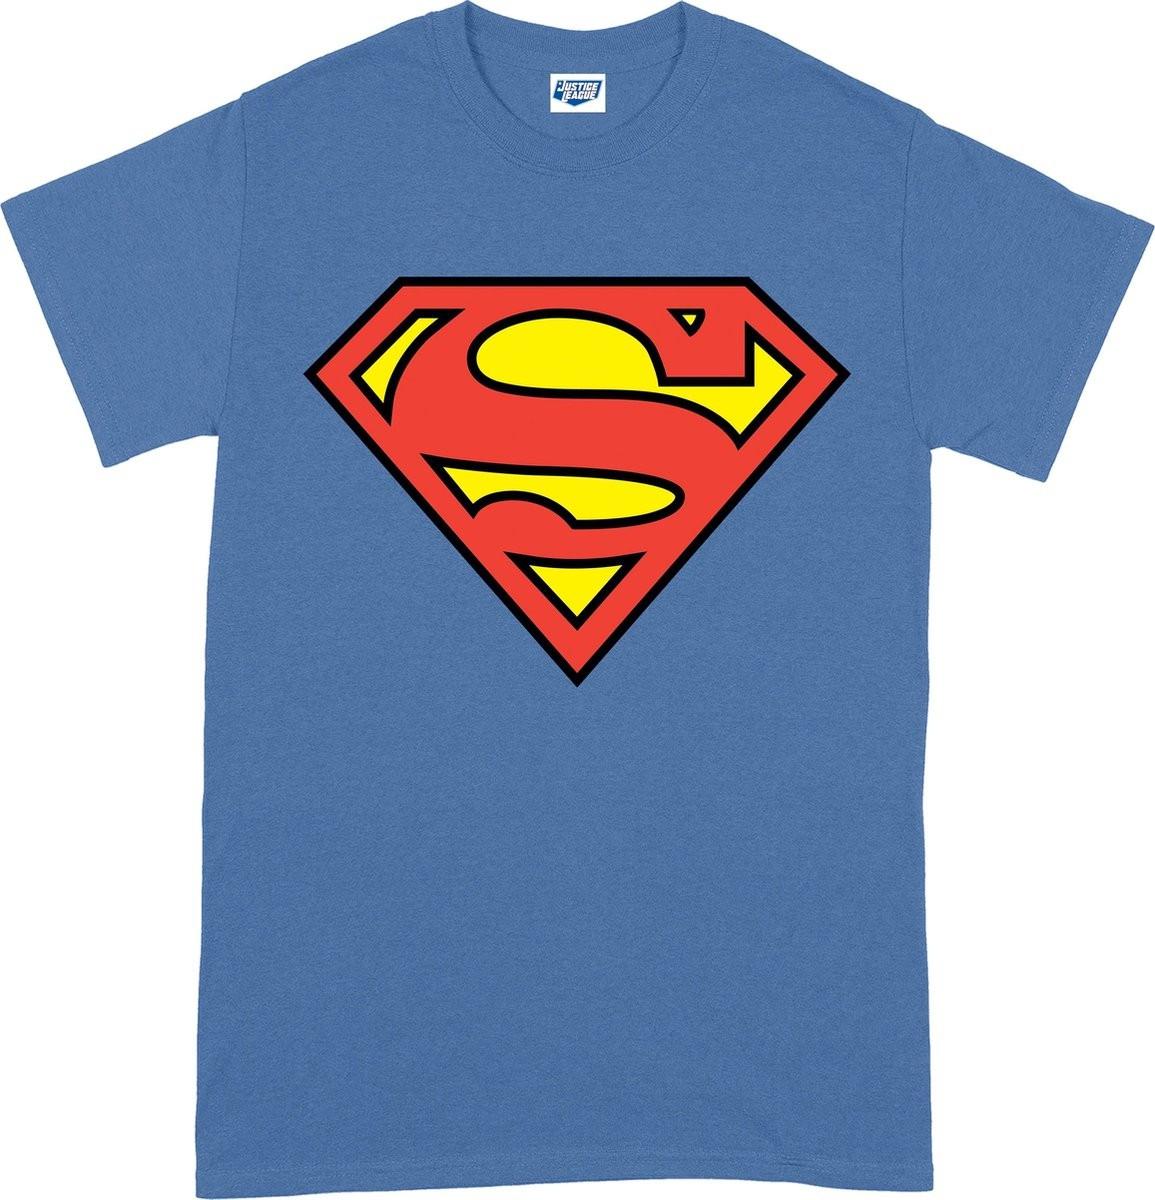 DC Originals Superman Shield mėlyni marškinėliai  - L dydis